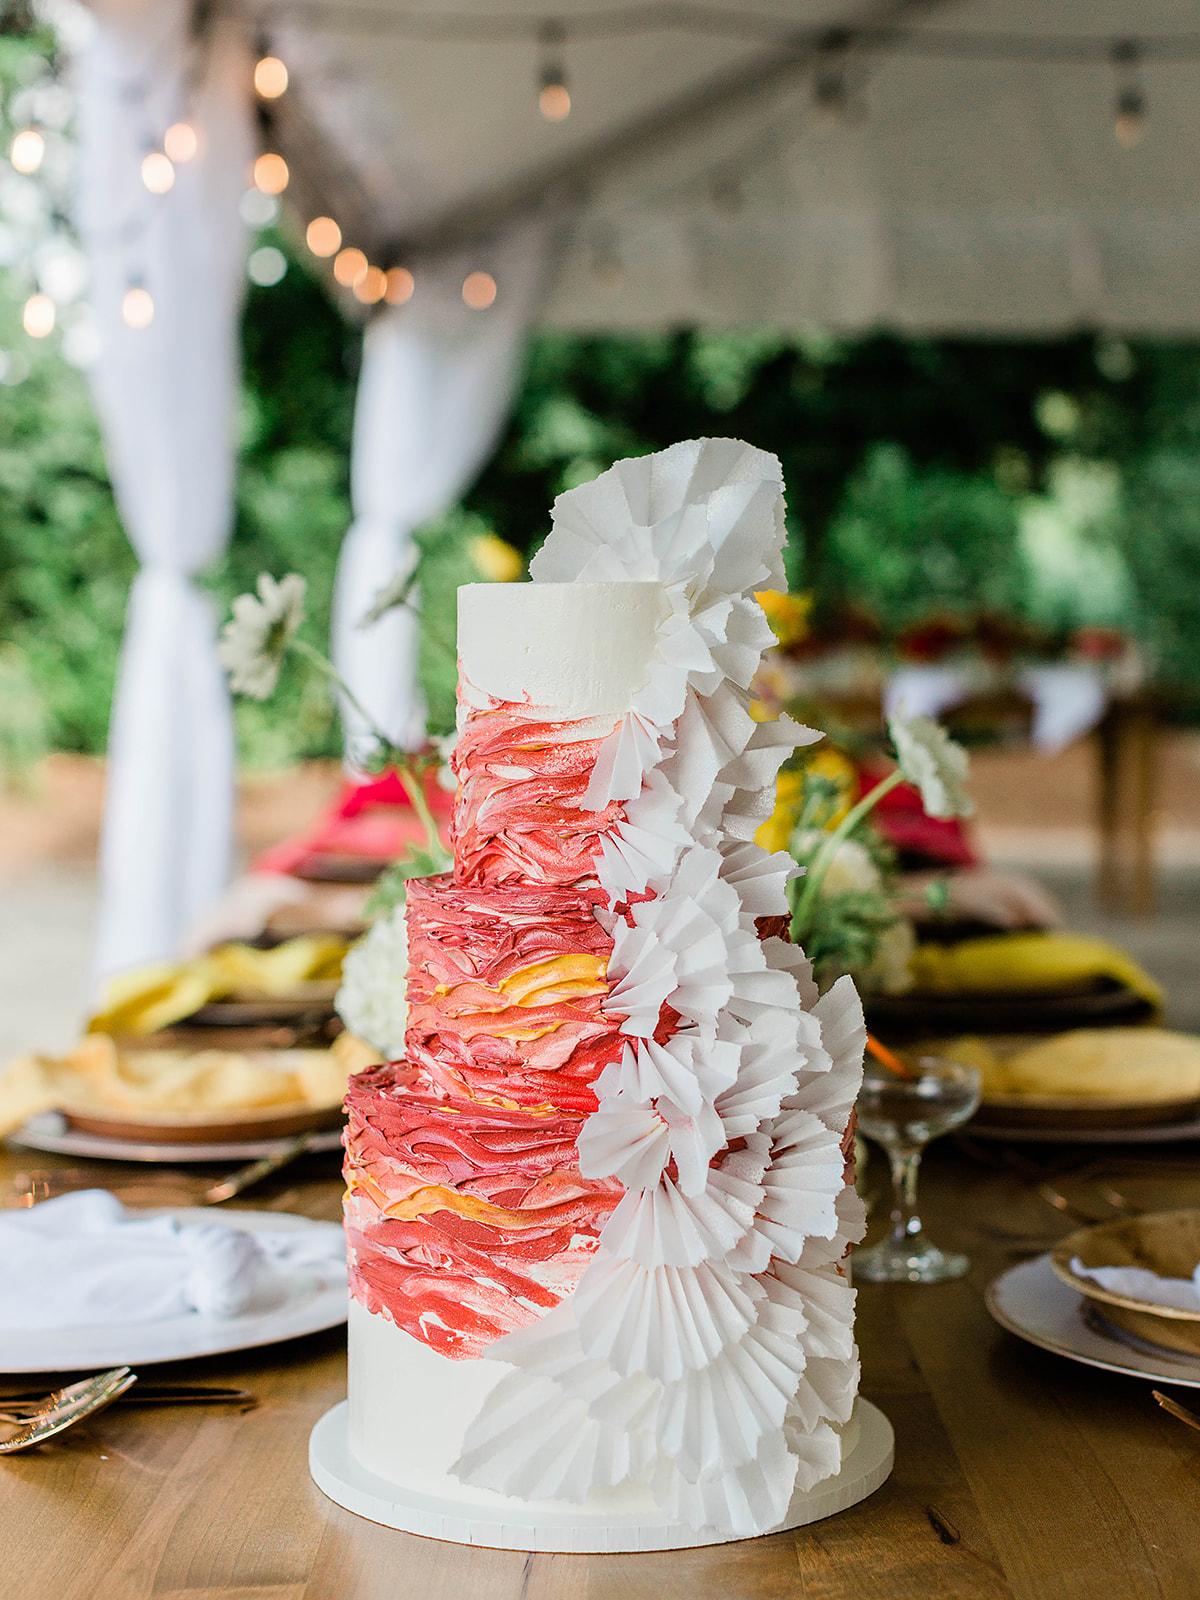 justin kevin wedding cake exterior